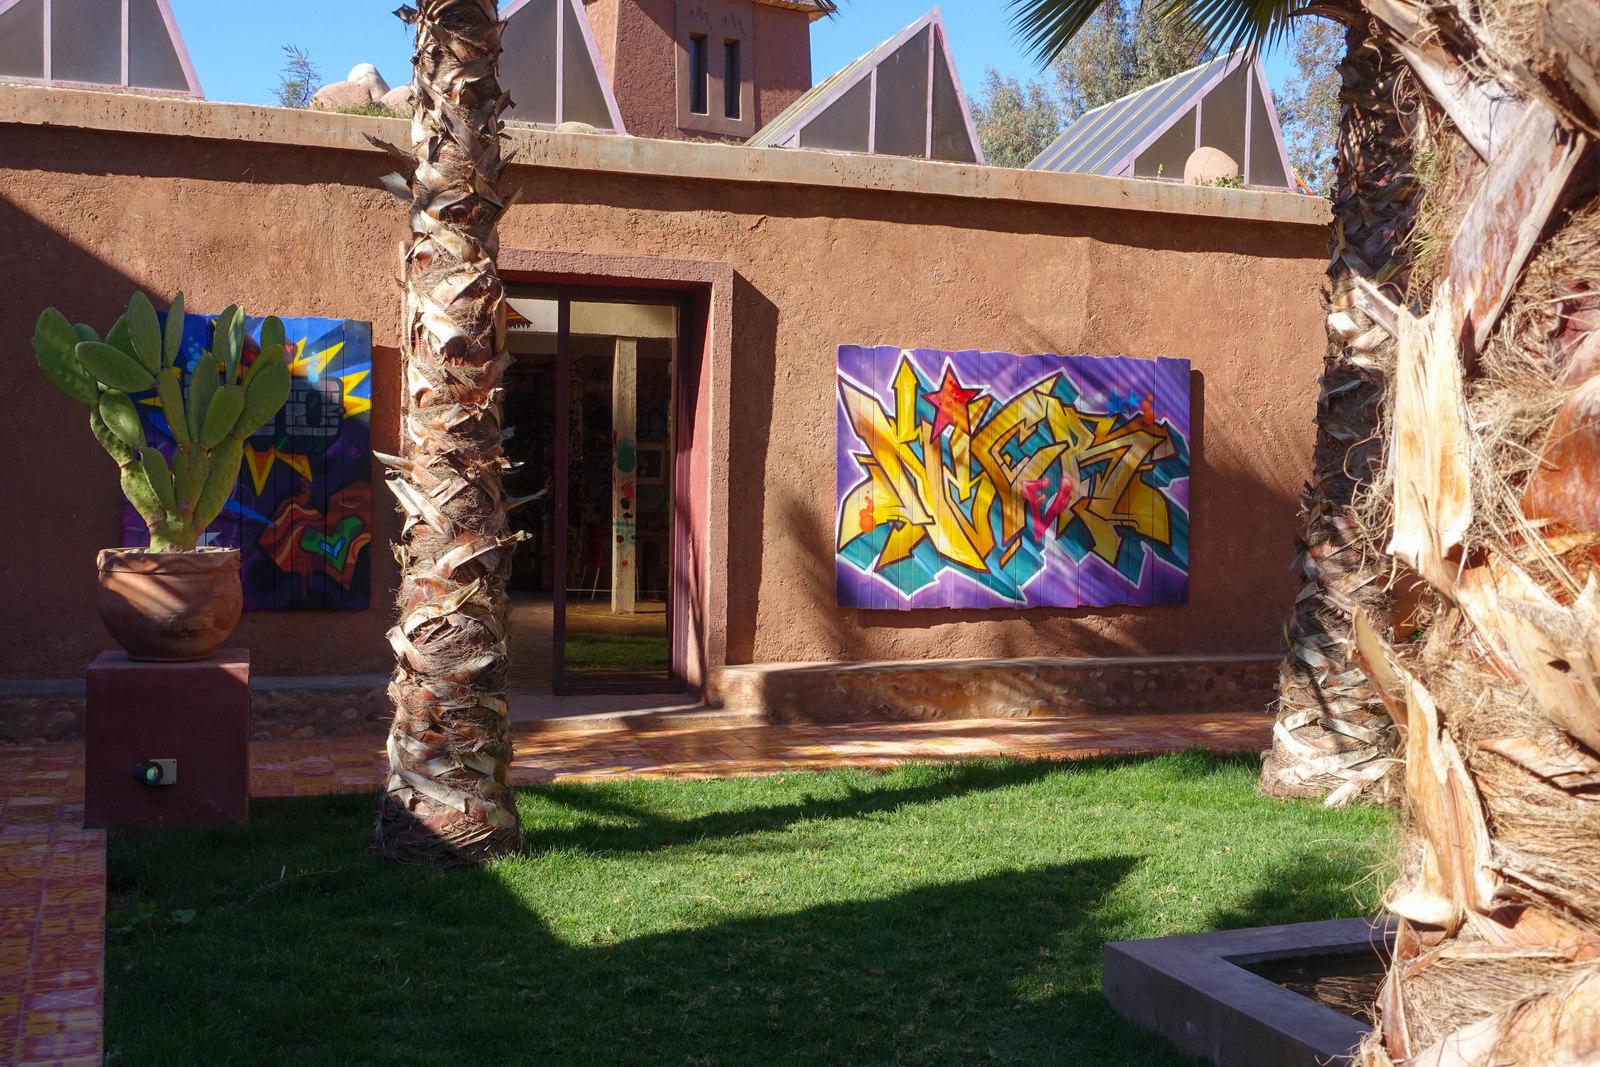 jardin rouge – ateliers, ausstellingsraum & werke